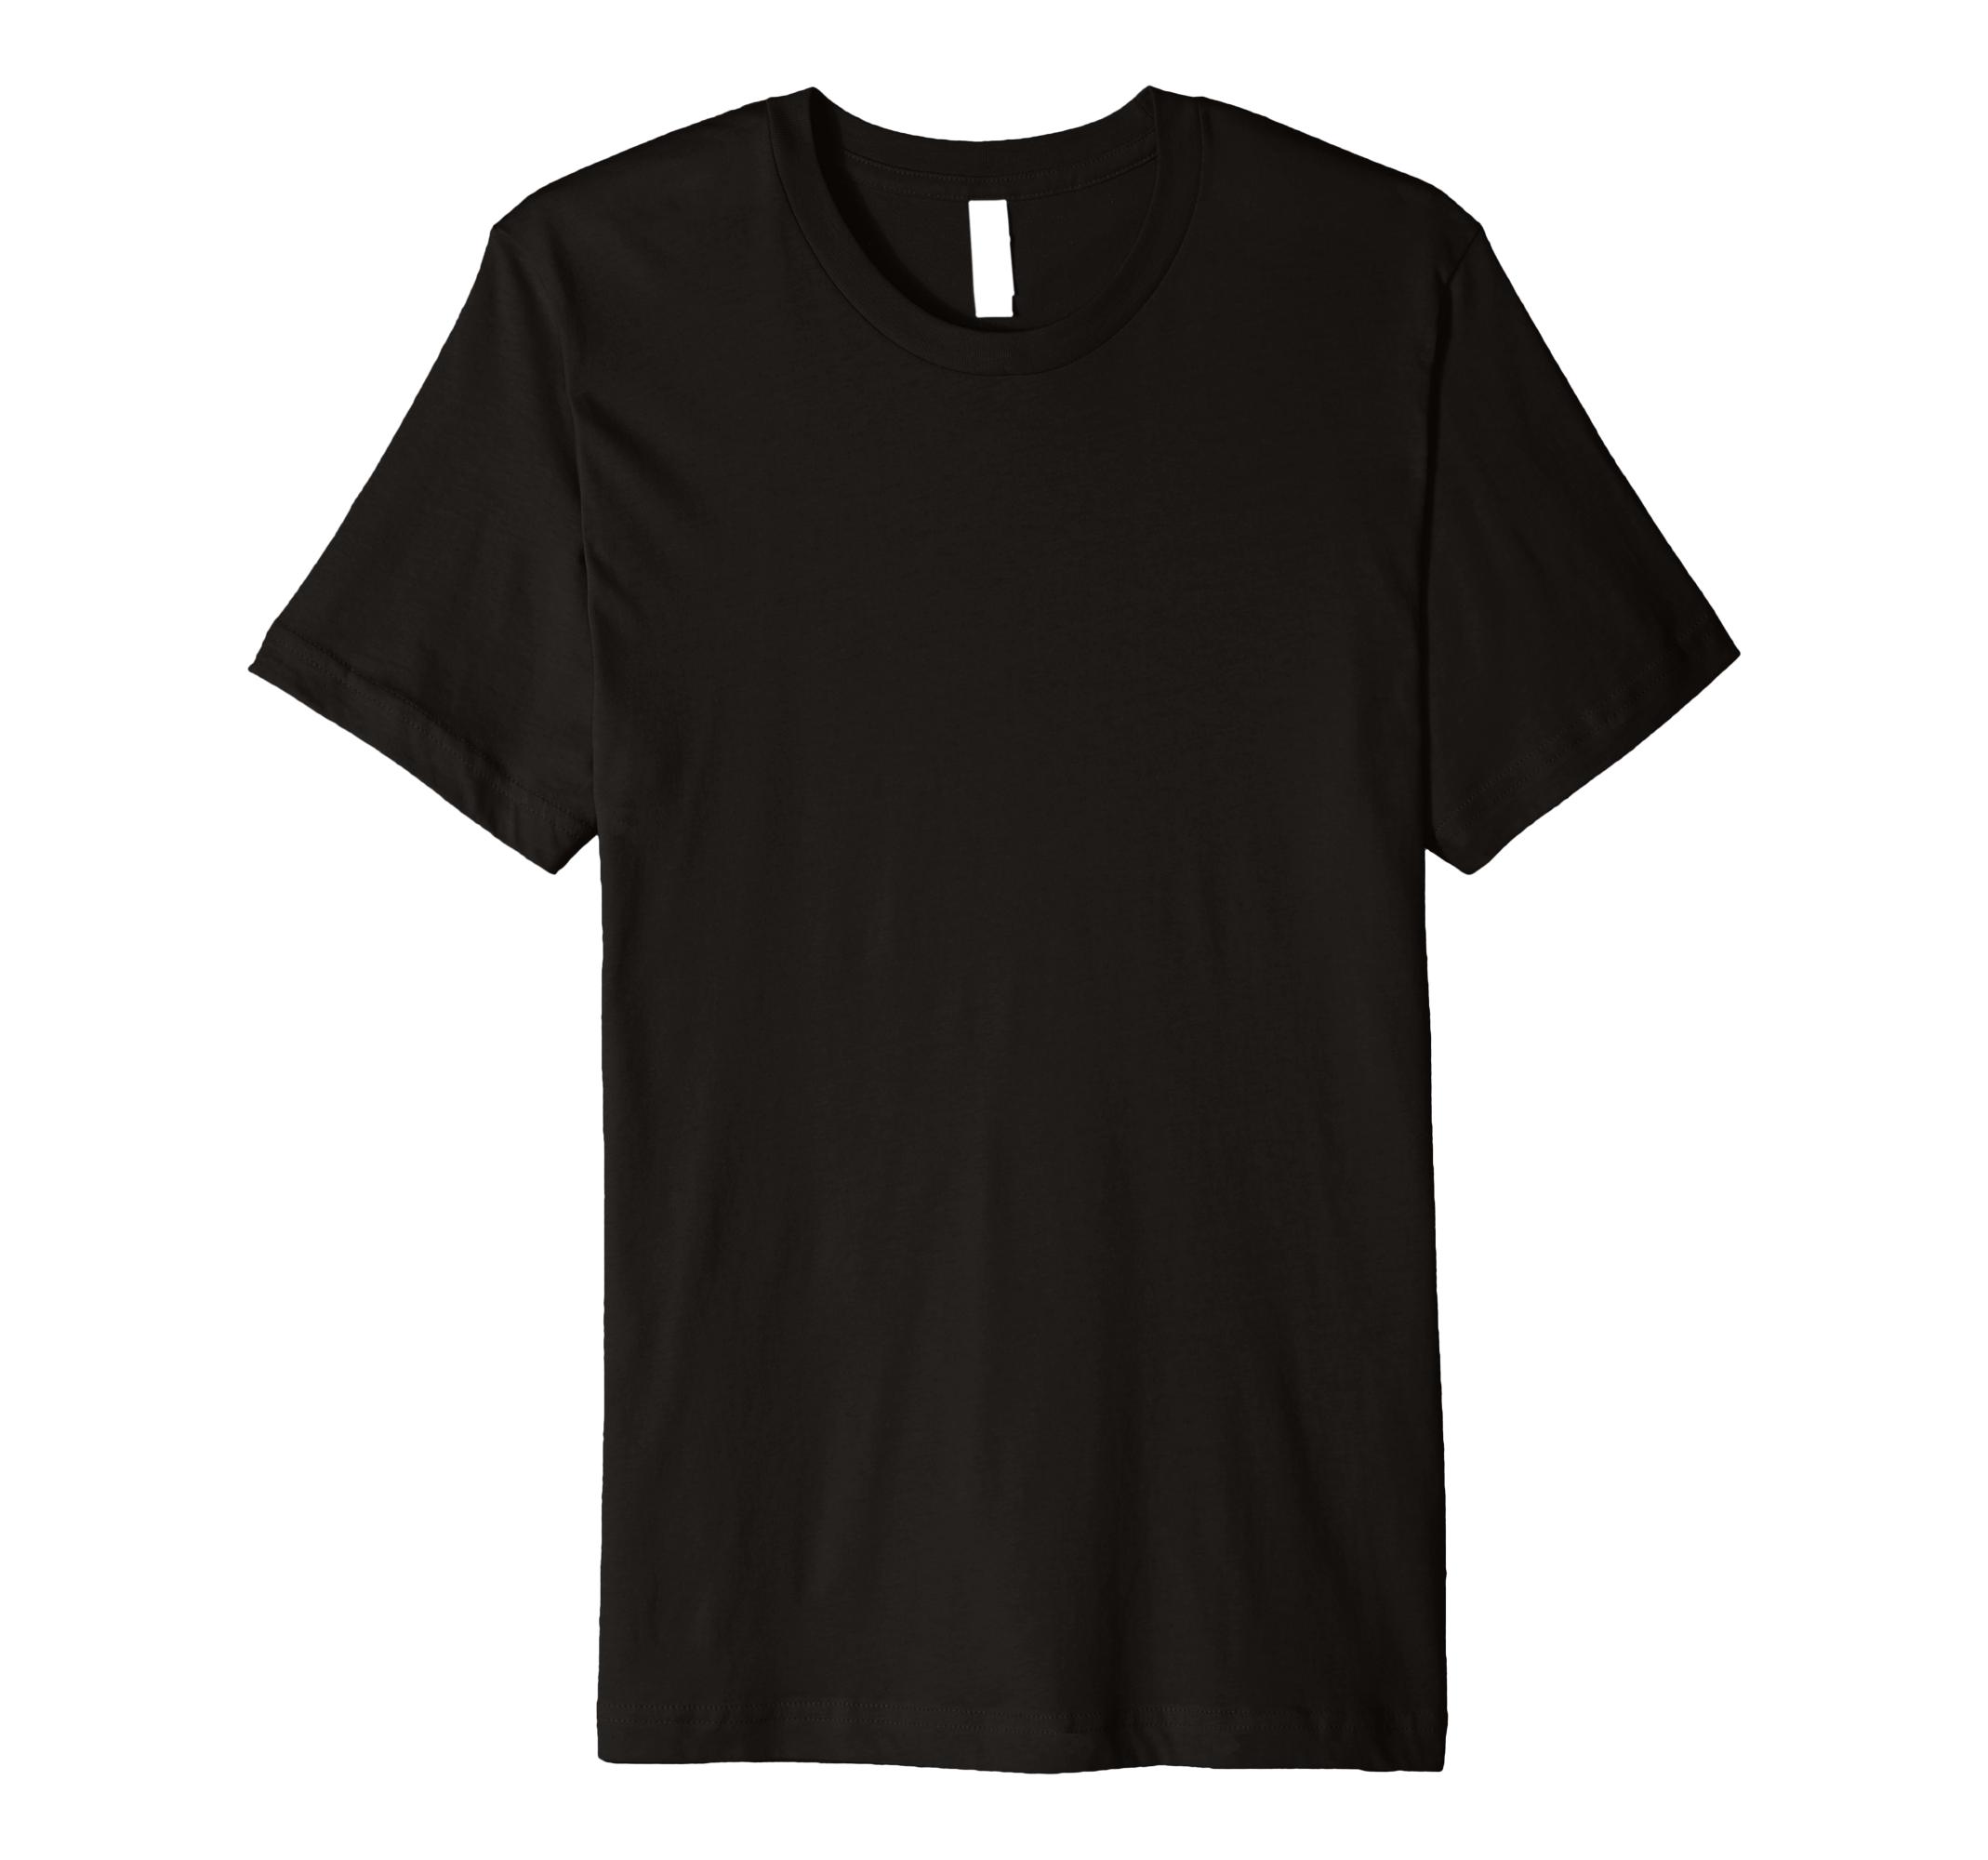 WALL.E # 4  EVE Kids Love Gift Unisex Short Sleeve White T-Shirts